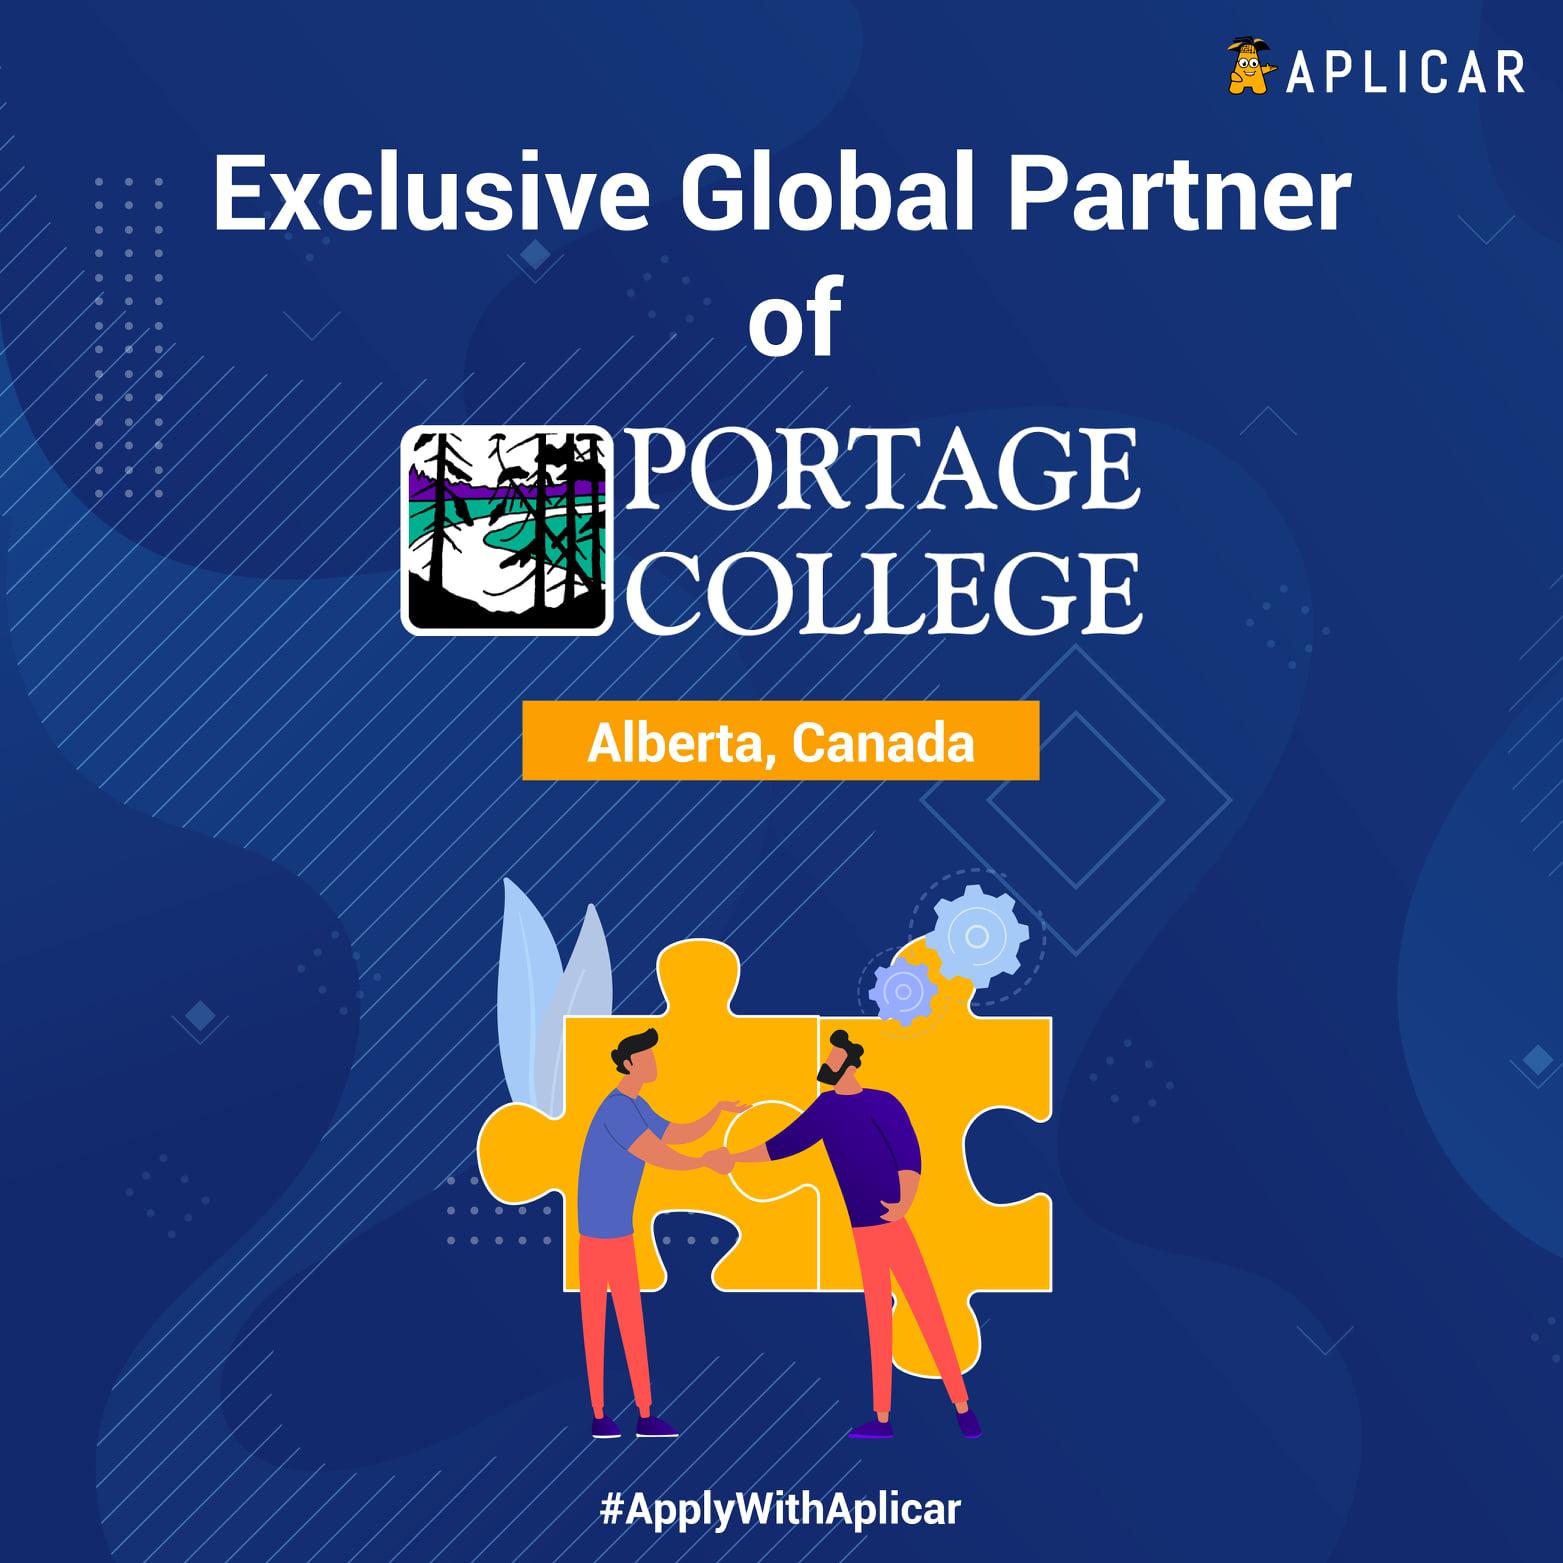 Aplicar Announces Exclusive Partnership with Portage College!